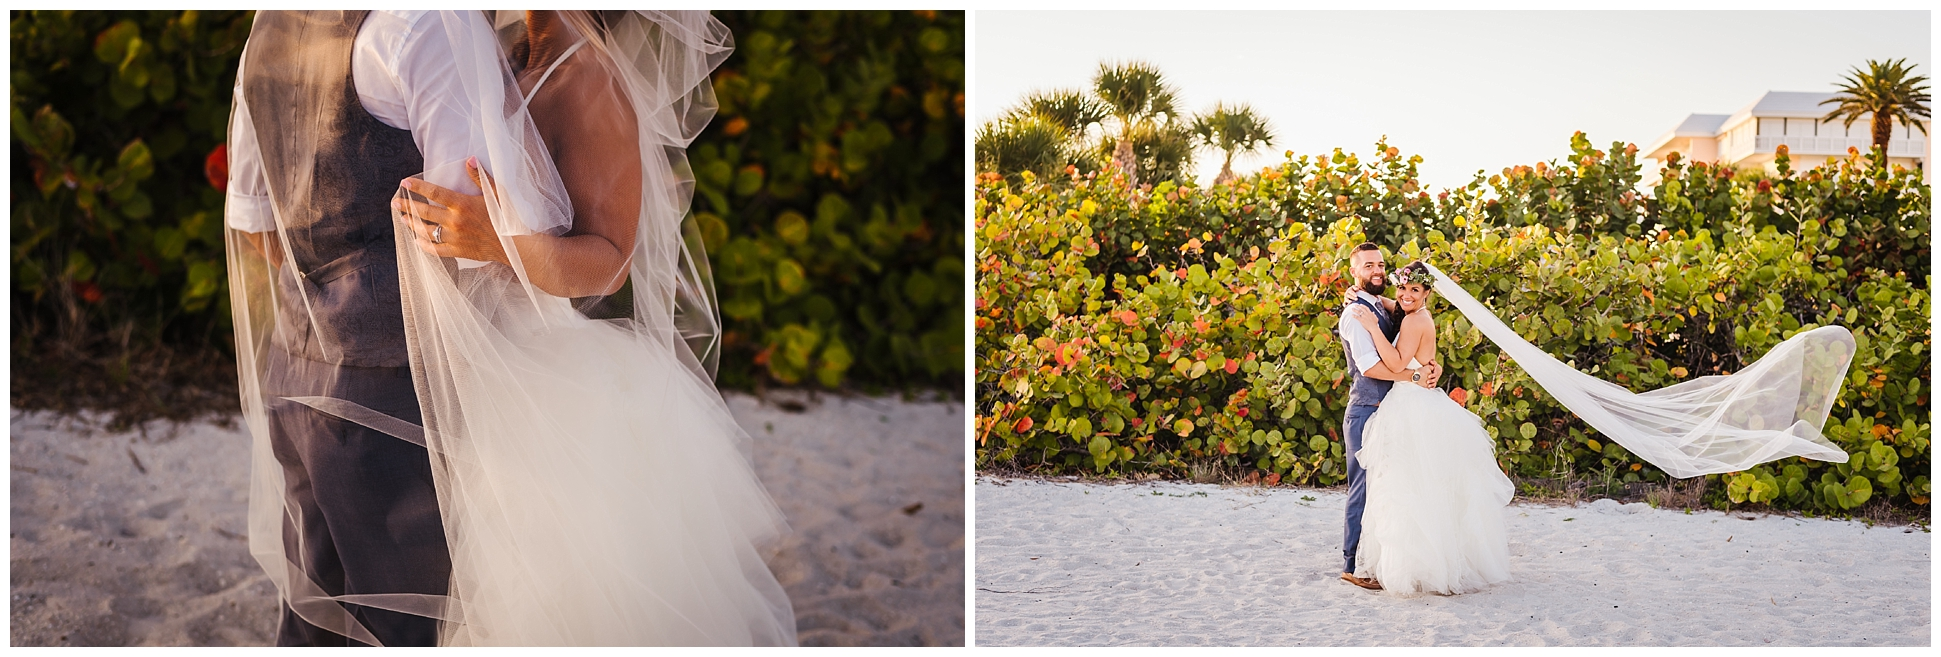 Tampa-wedding-photographer-vera-wang-flower-crown-post-card-inn_0036.jpg